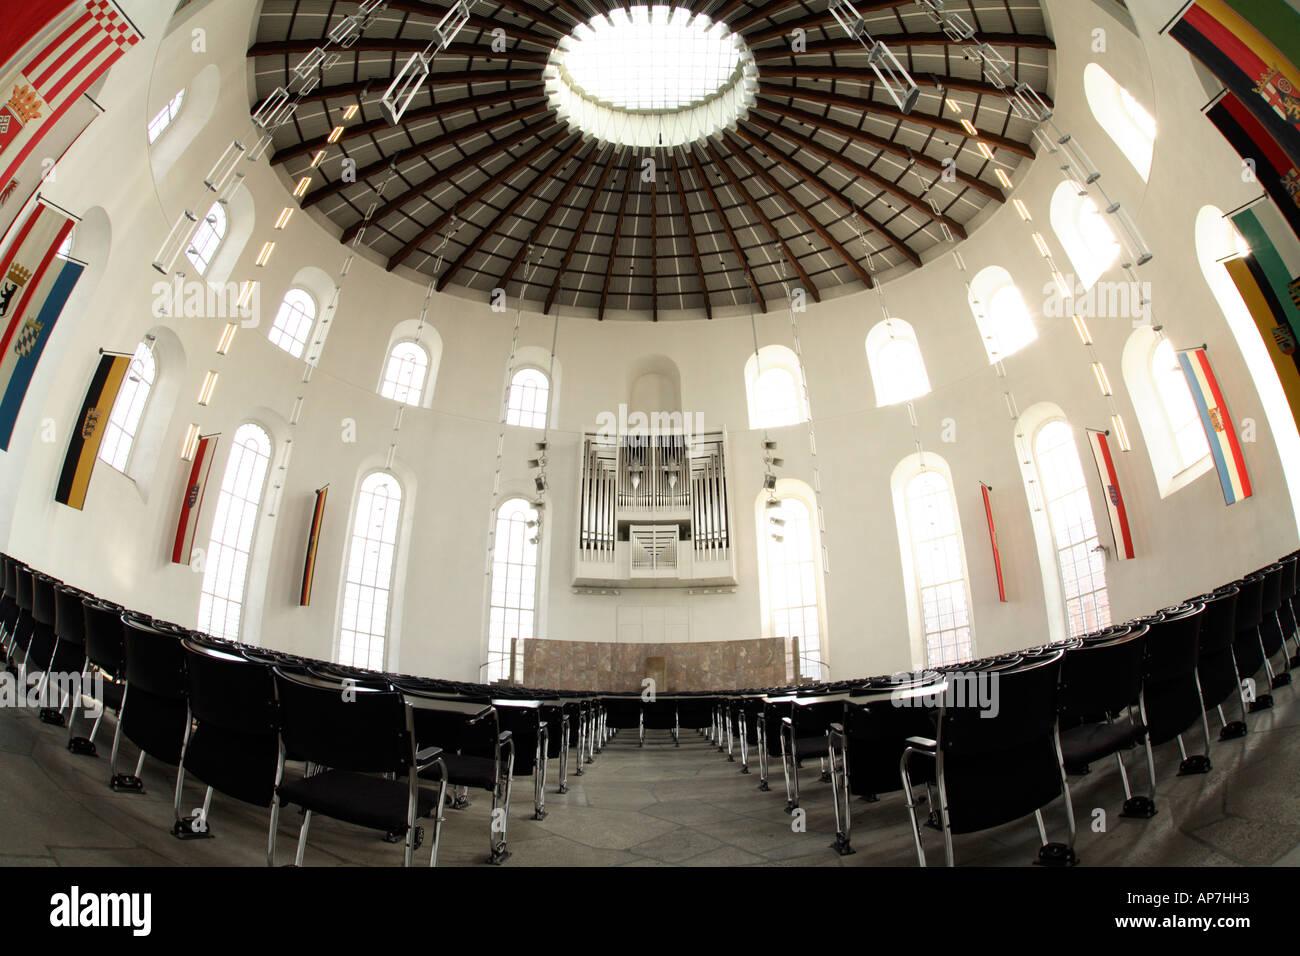 View inside Paulskirche Frankfurt Stock Photo